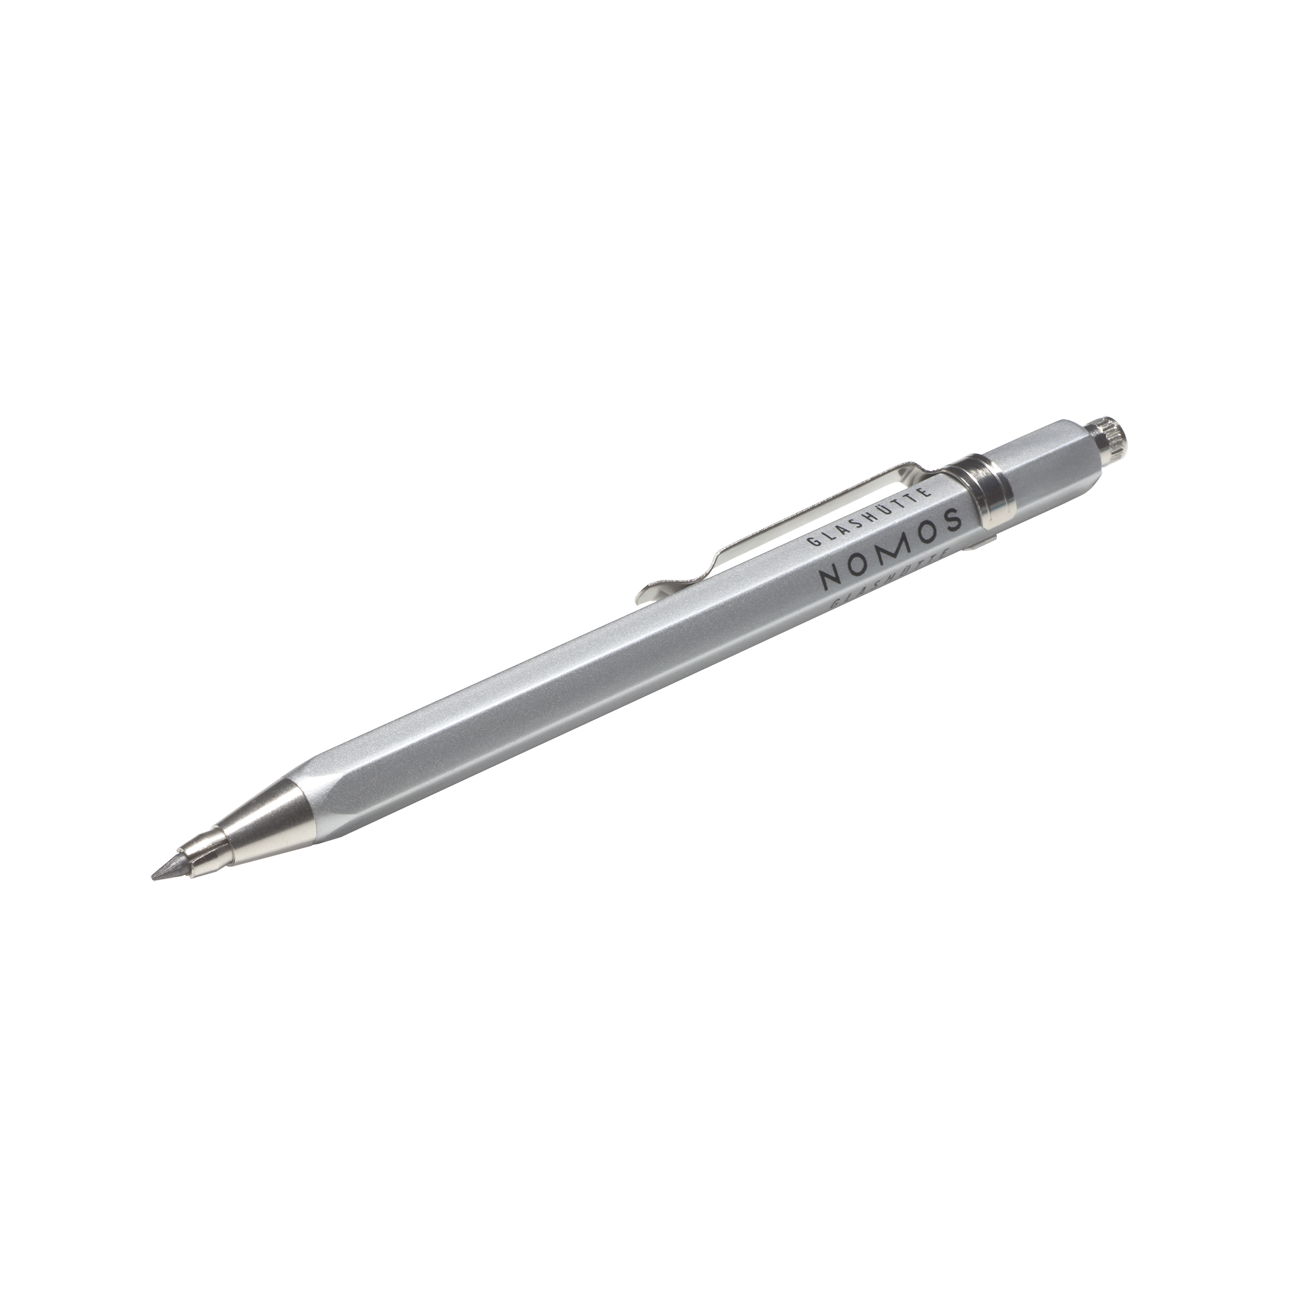 Drafting Pencil Silver Mechanical Pencils Pinterest Drafting - Drafting pencil